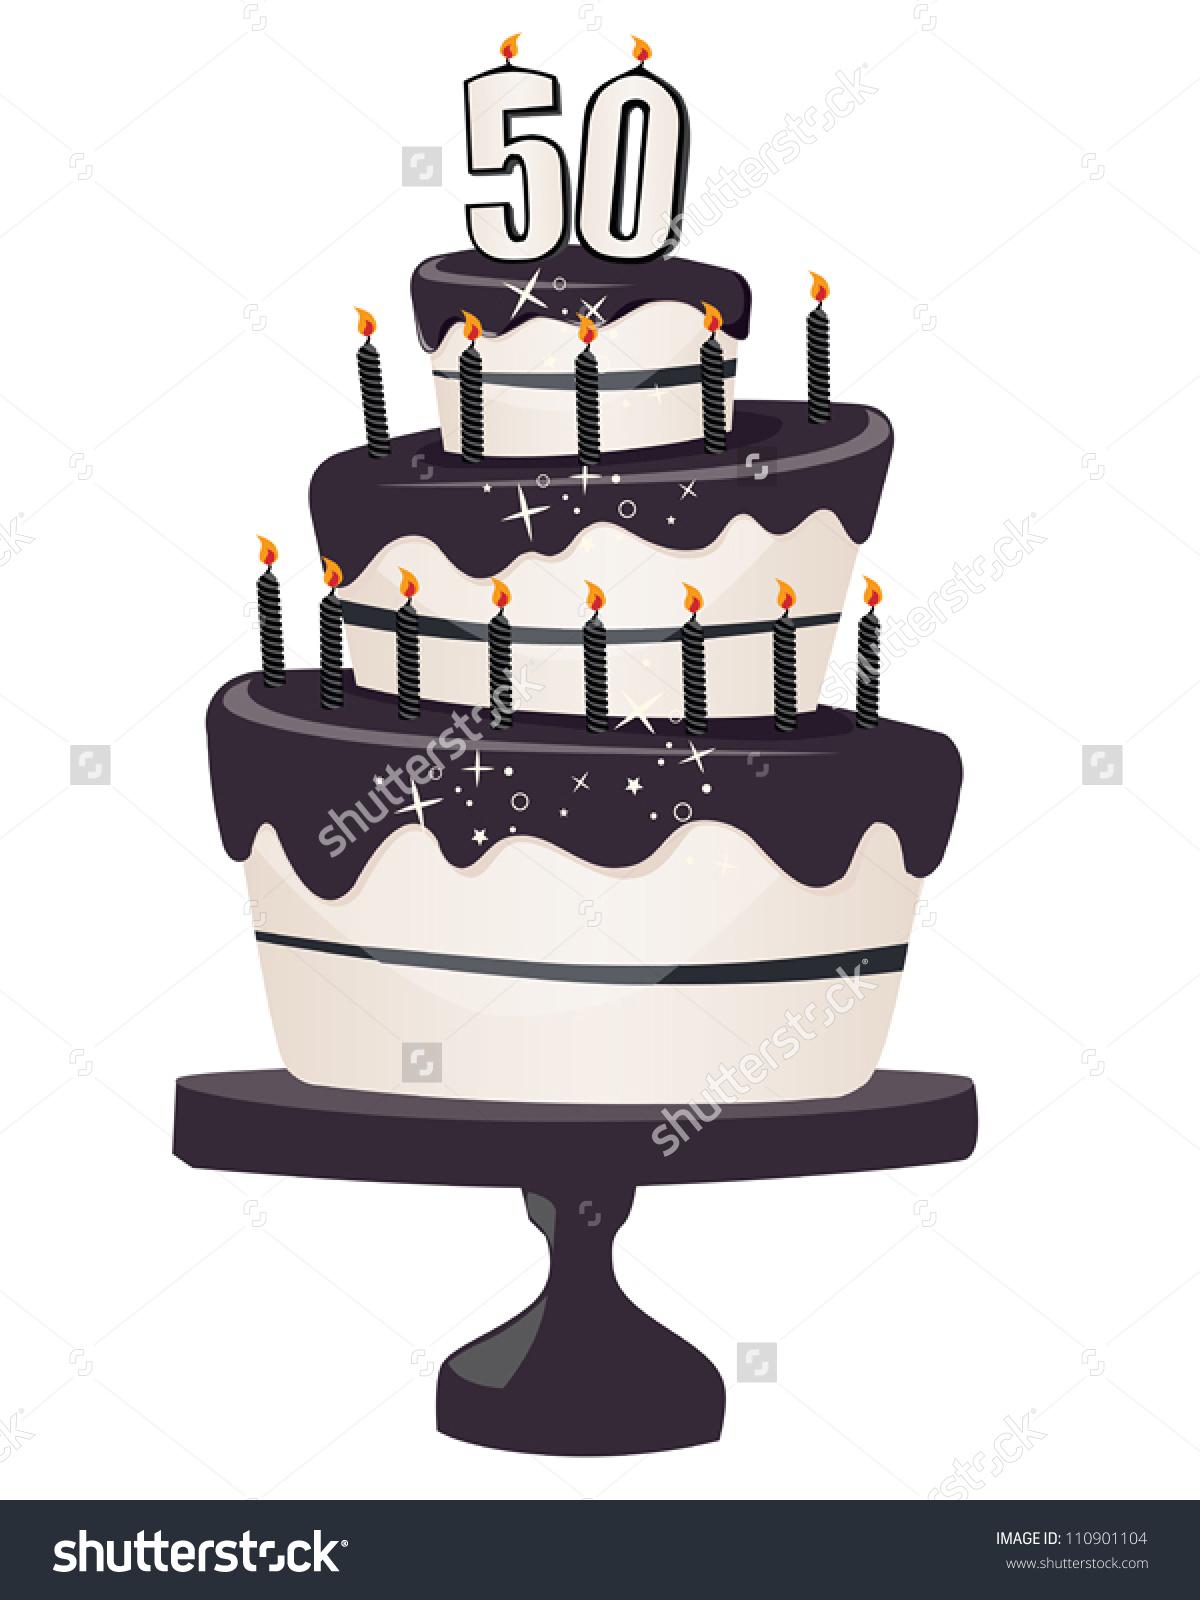 50th birthday cake clipart-50th birthday cake clipart-14